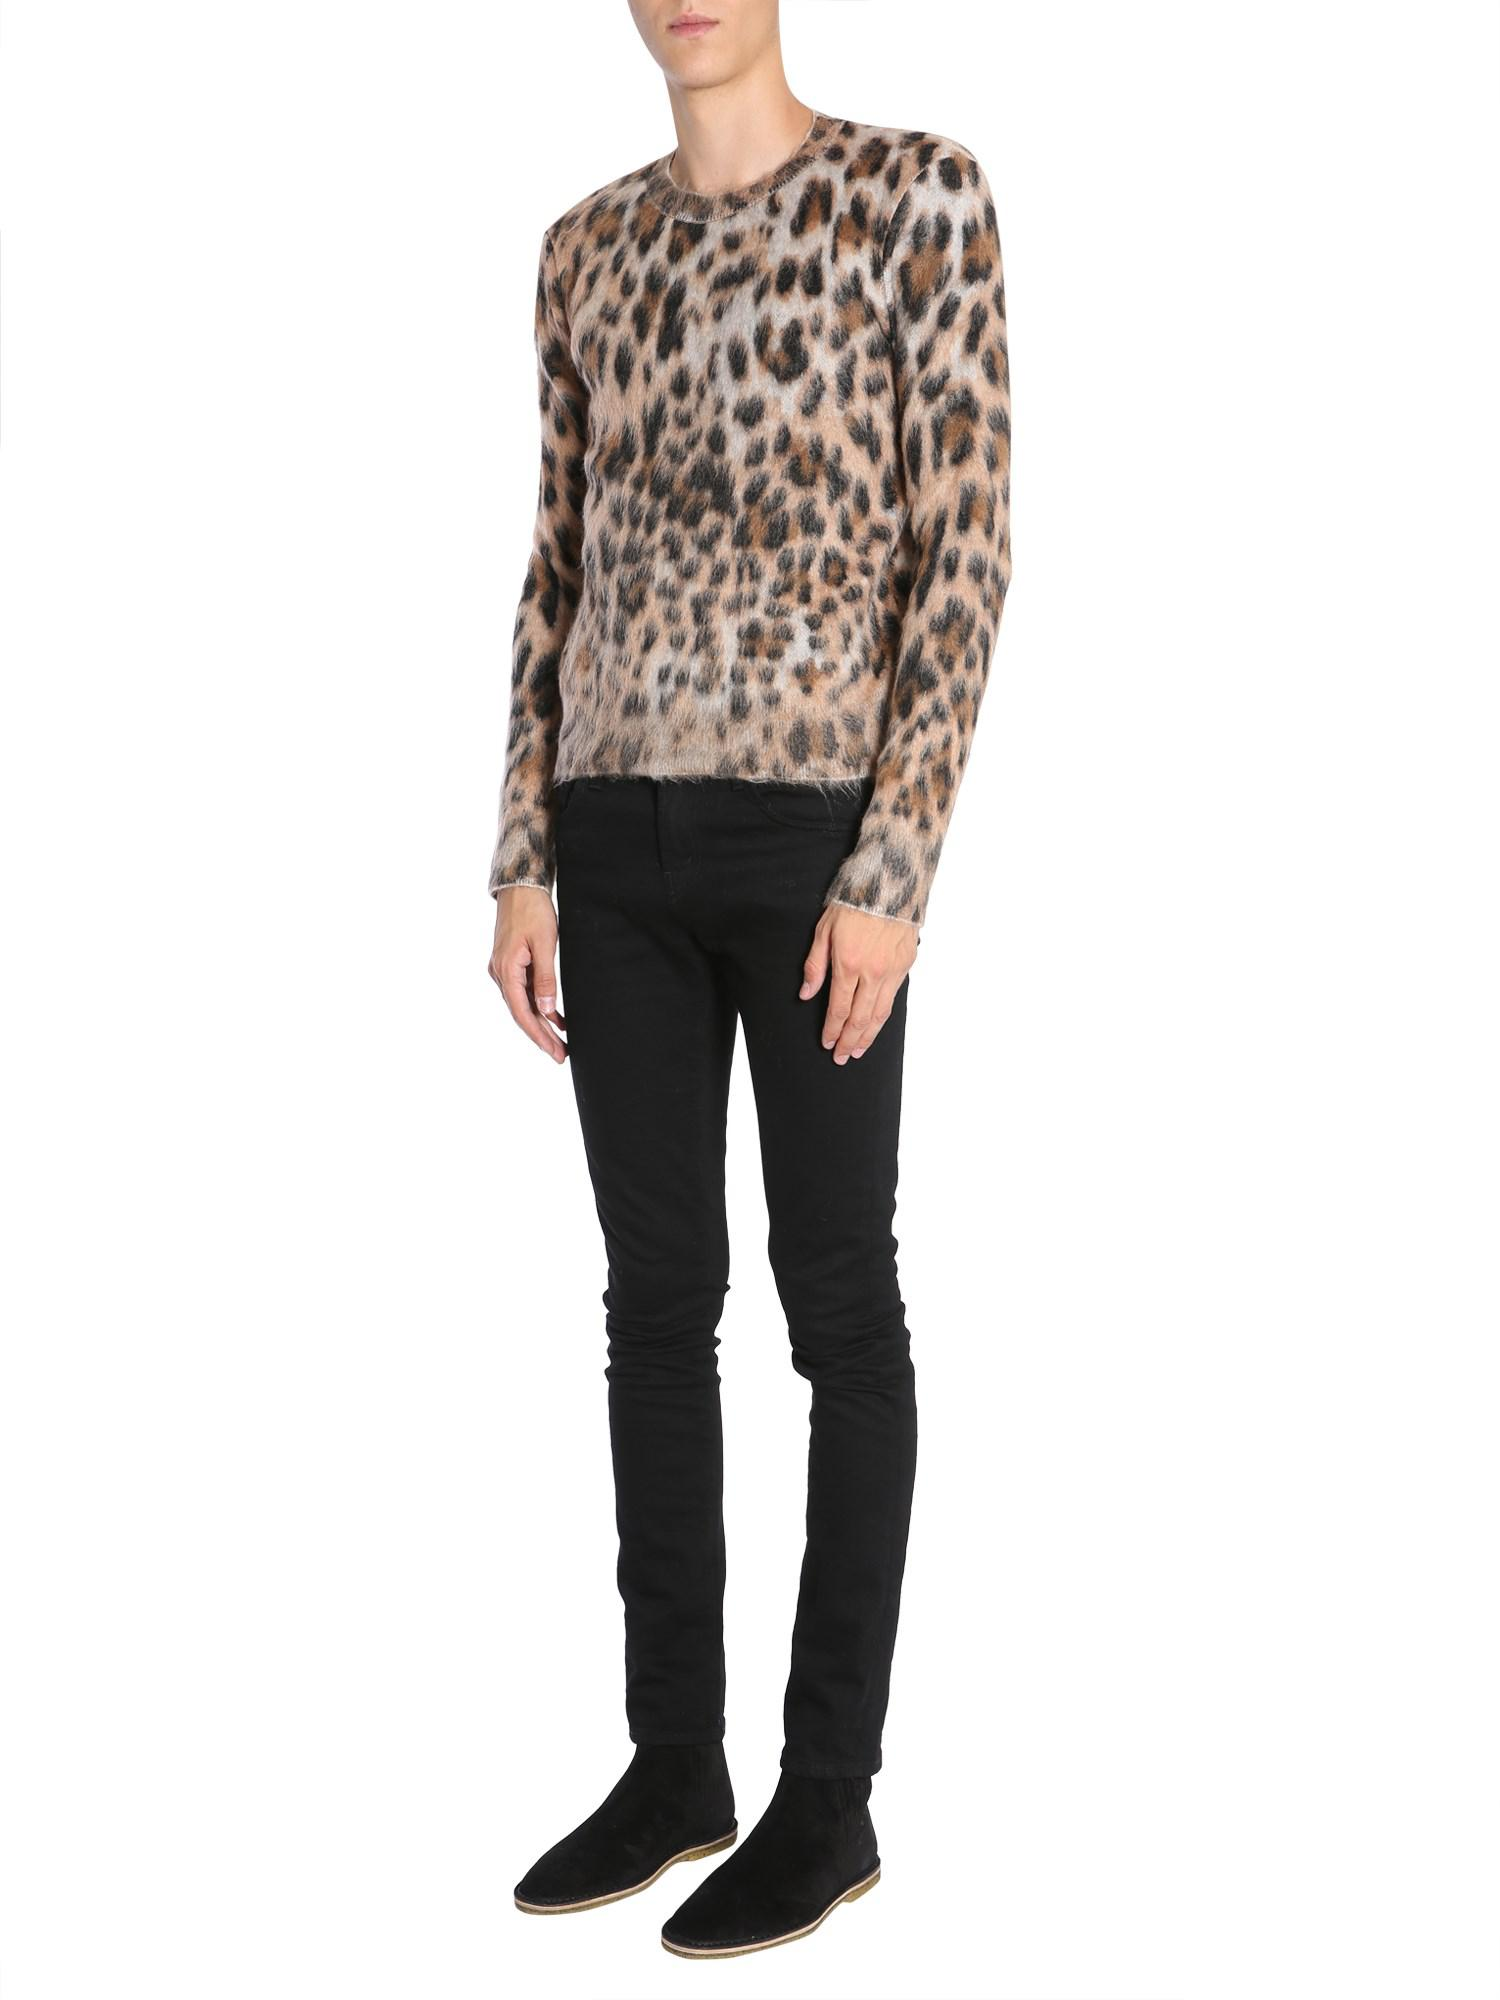 645fb9515e8 Lyst - Saint Laurent Textured Leopard Print Sweater in Brown for Men ...